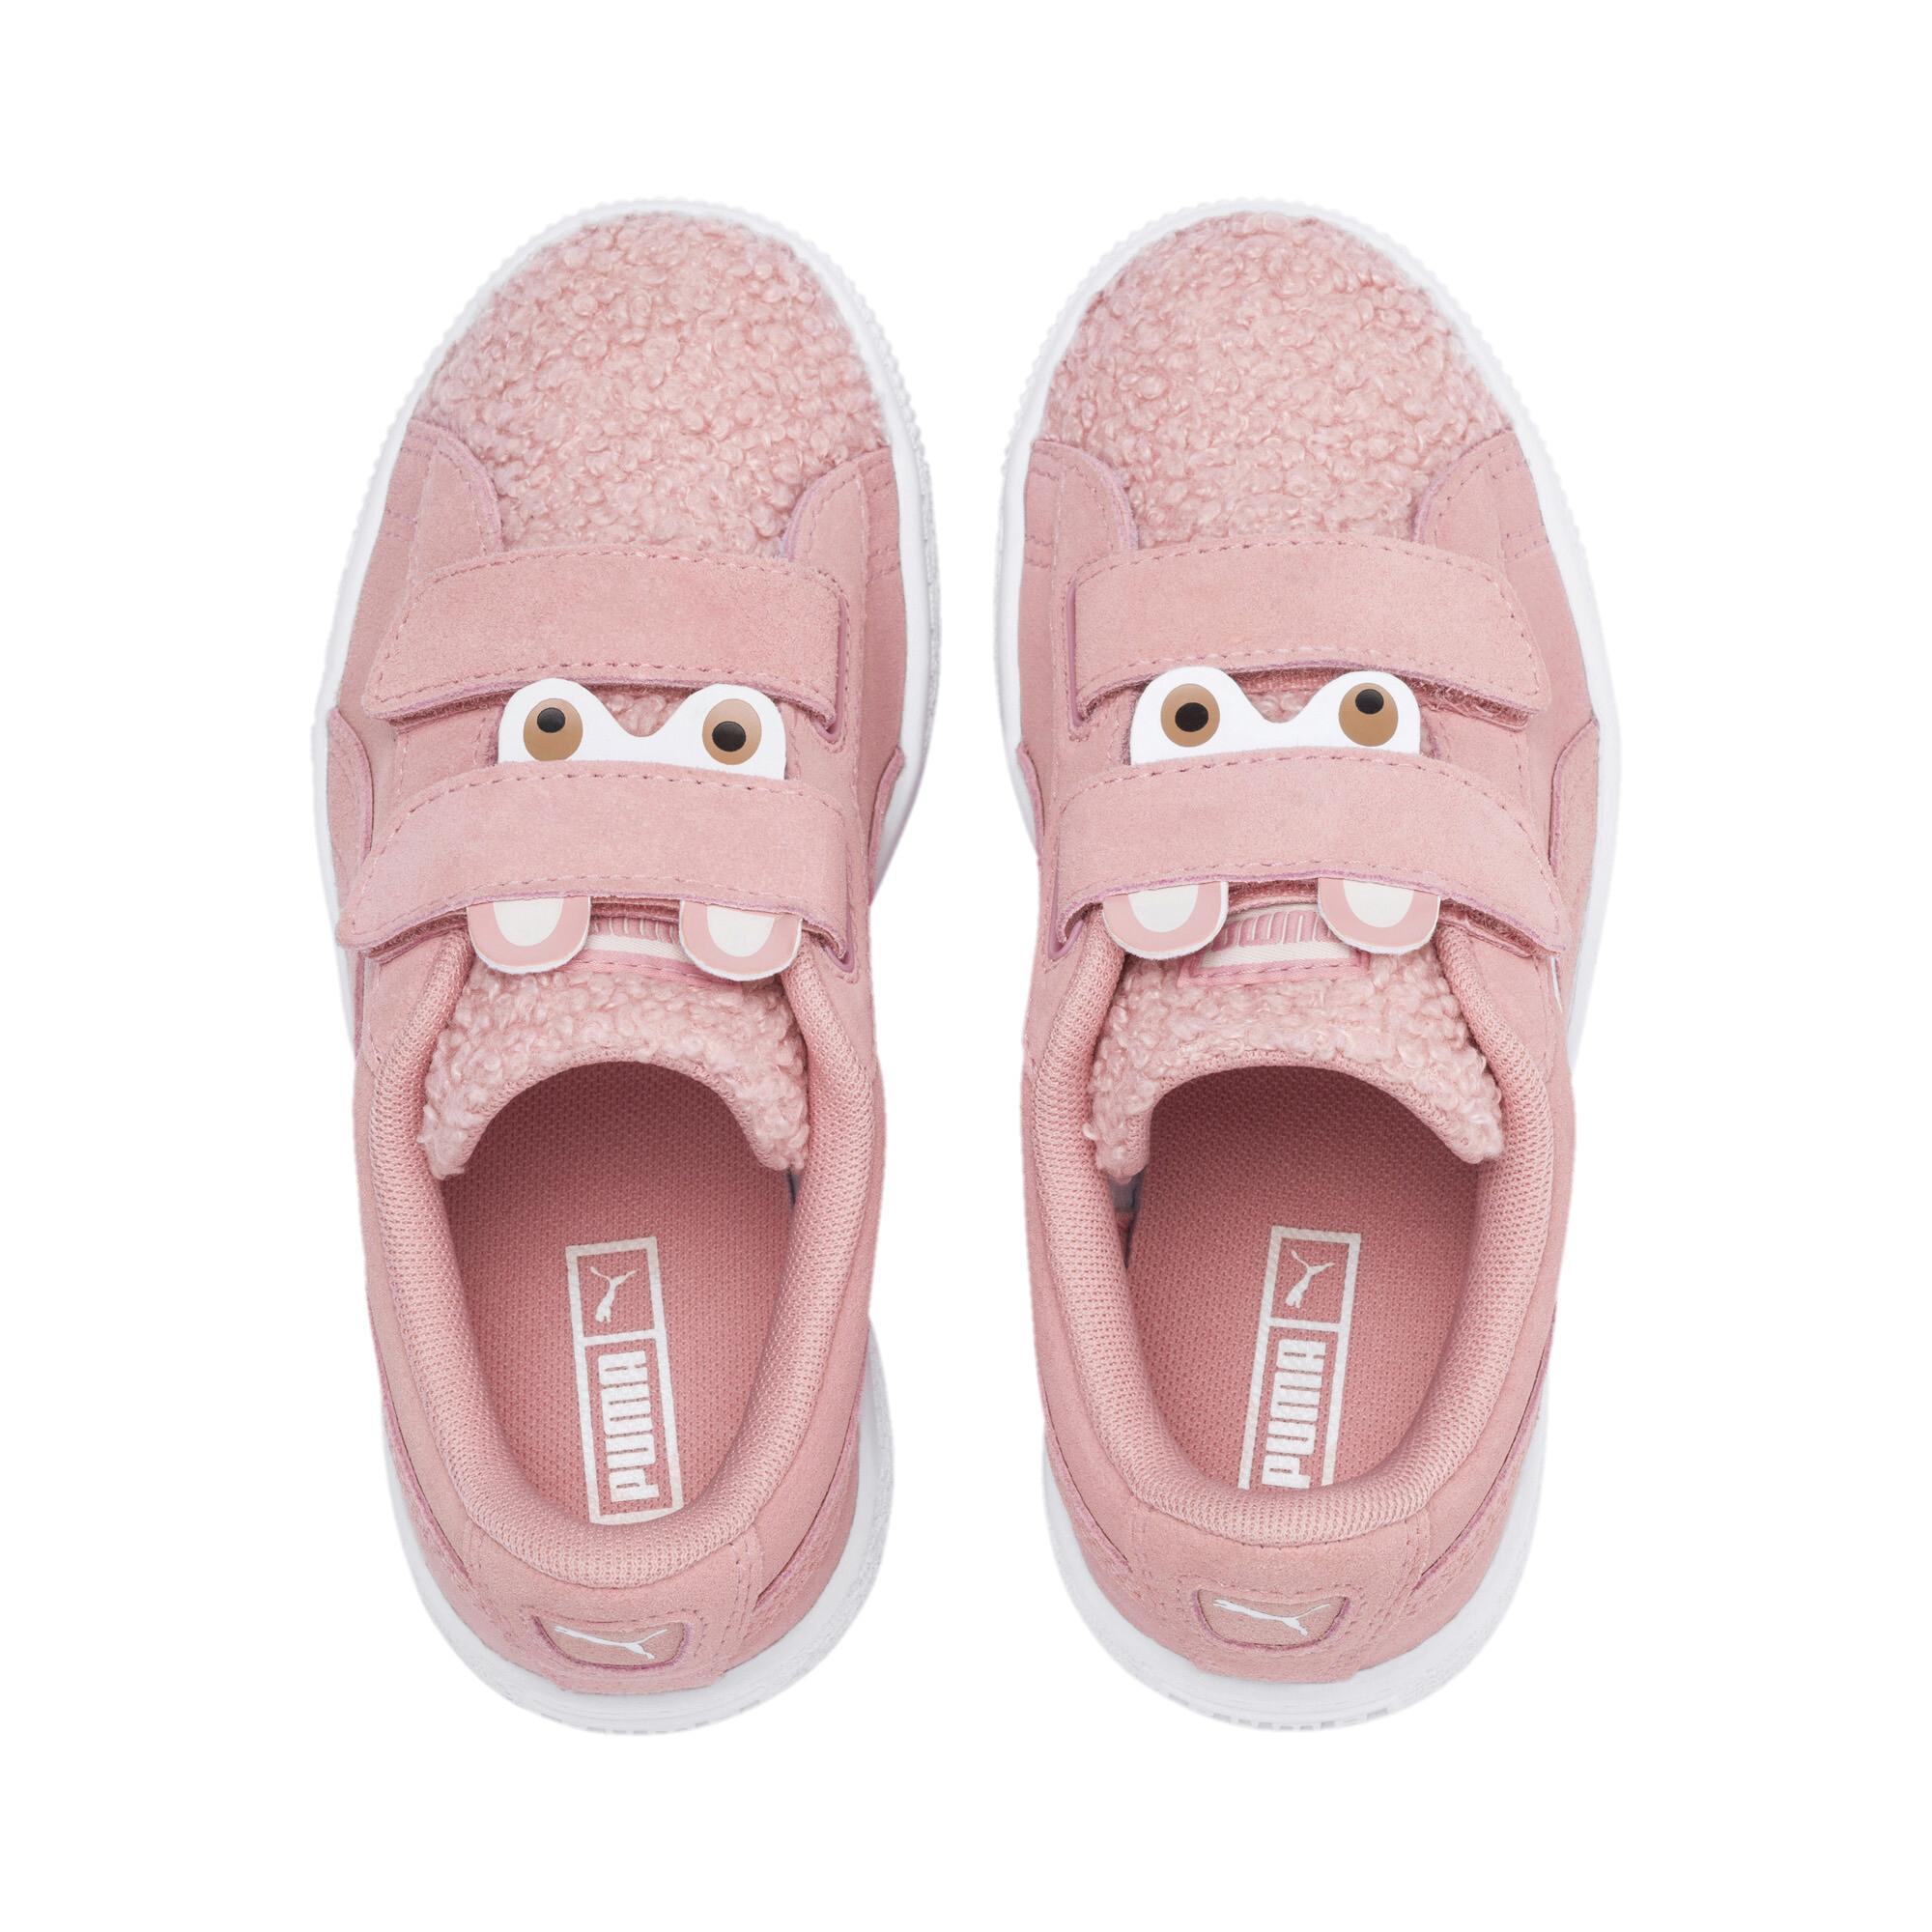 PUMA-Suede-Winter-Monster-Little-Kids-039-Shoes-Kids-Shoe-Kids thumbnail 7